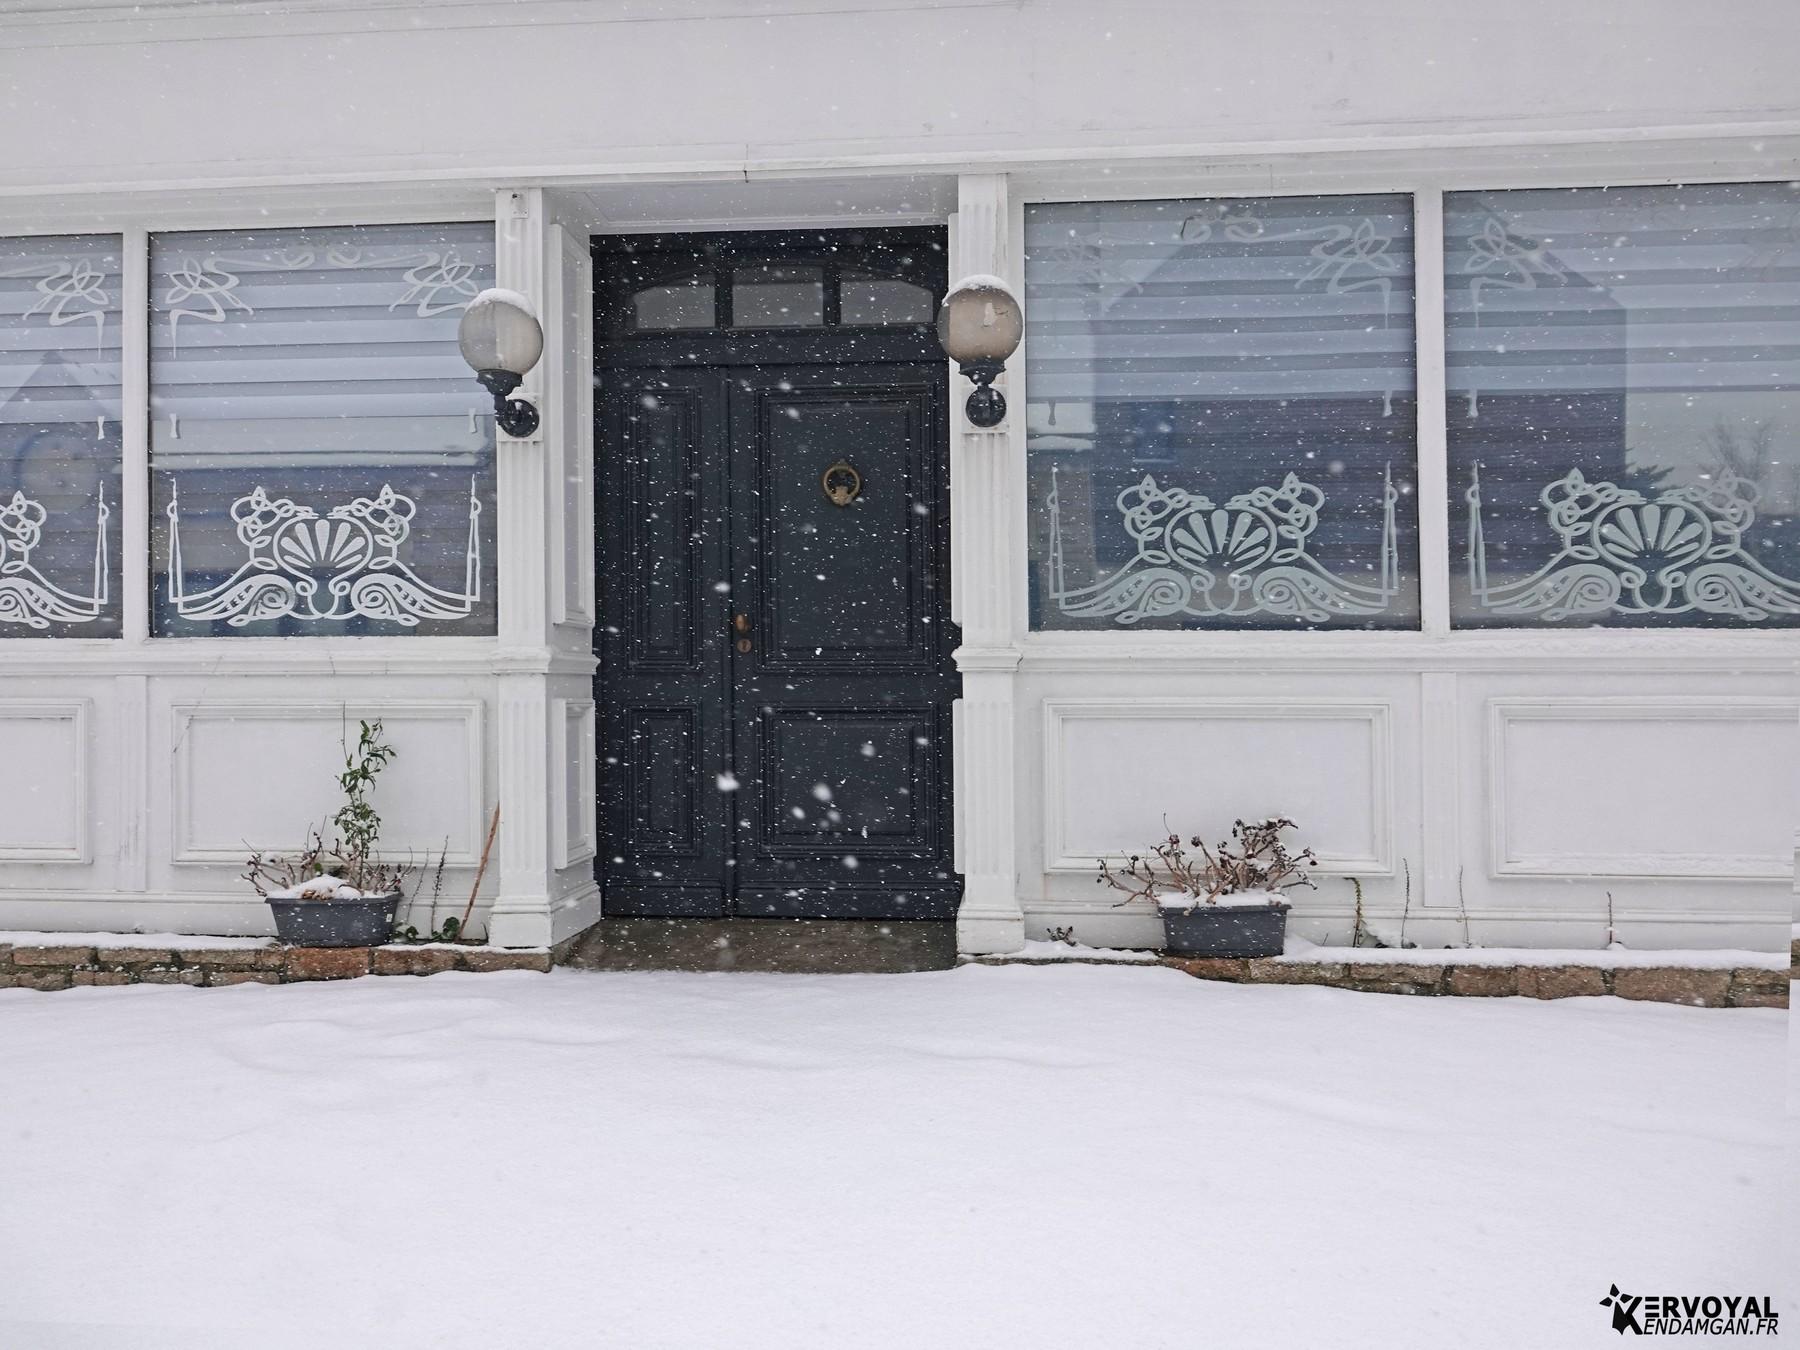 neige à kervoyal 11 février 2021 damgan morbihan (30)